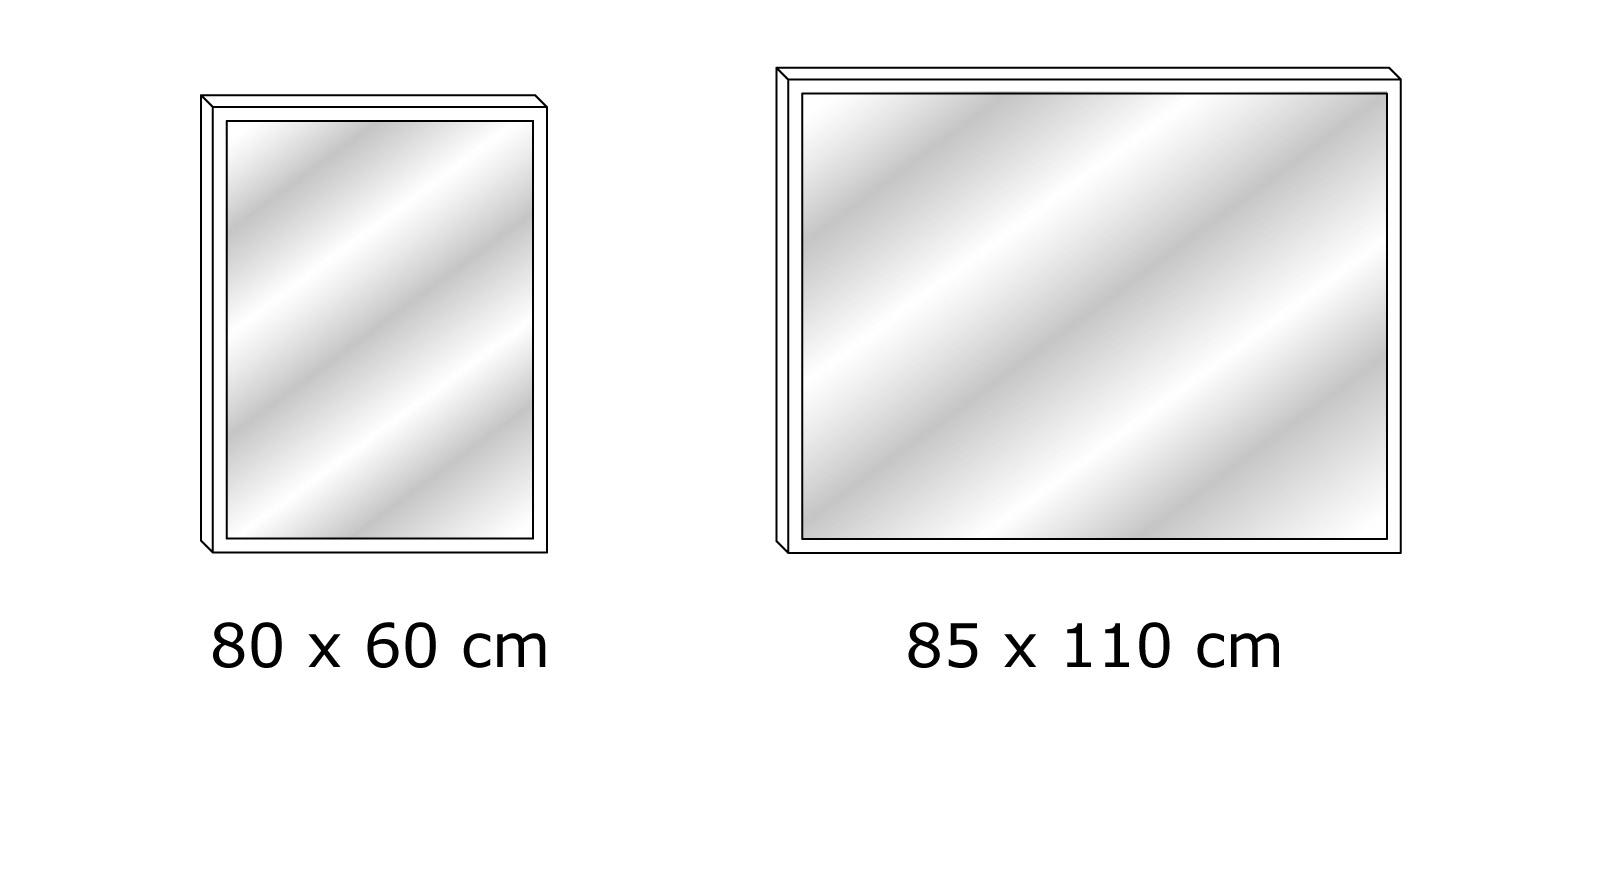 Grafik der 2 Varianten des Wandspiegels